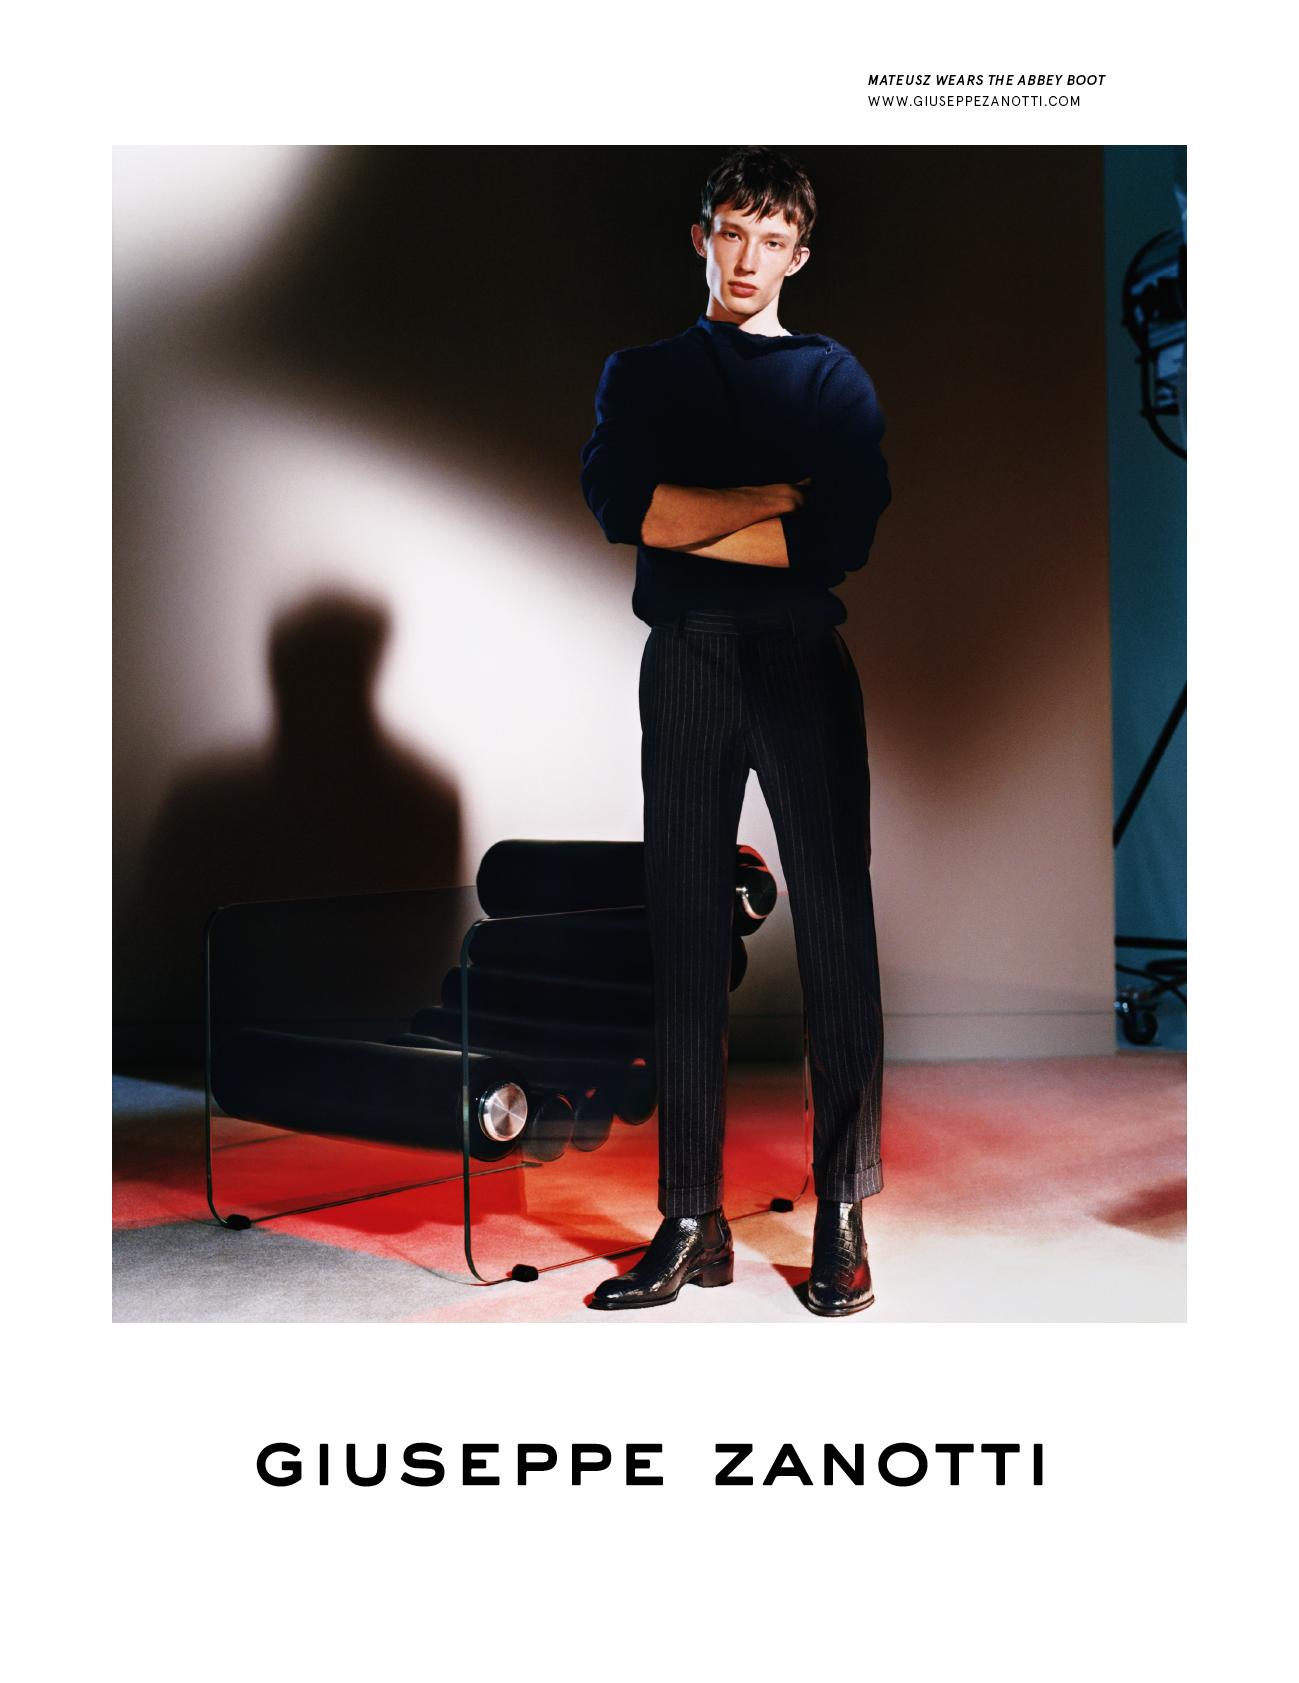 giuseppe_zanotti_fall_2019_campaign3.jpg